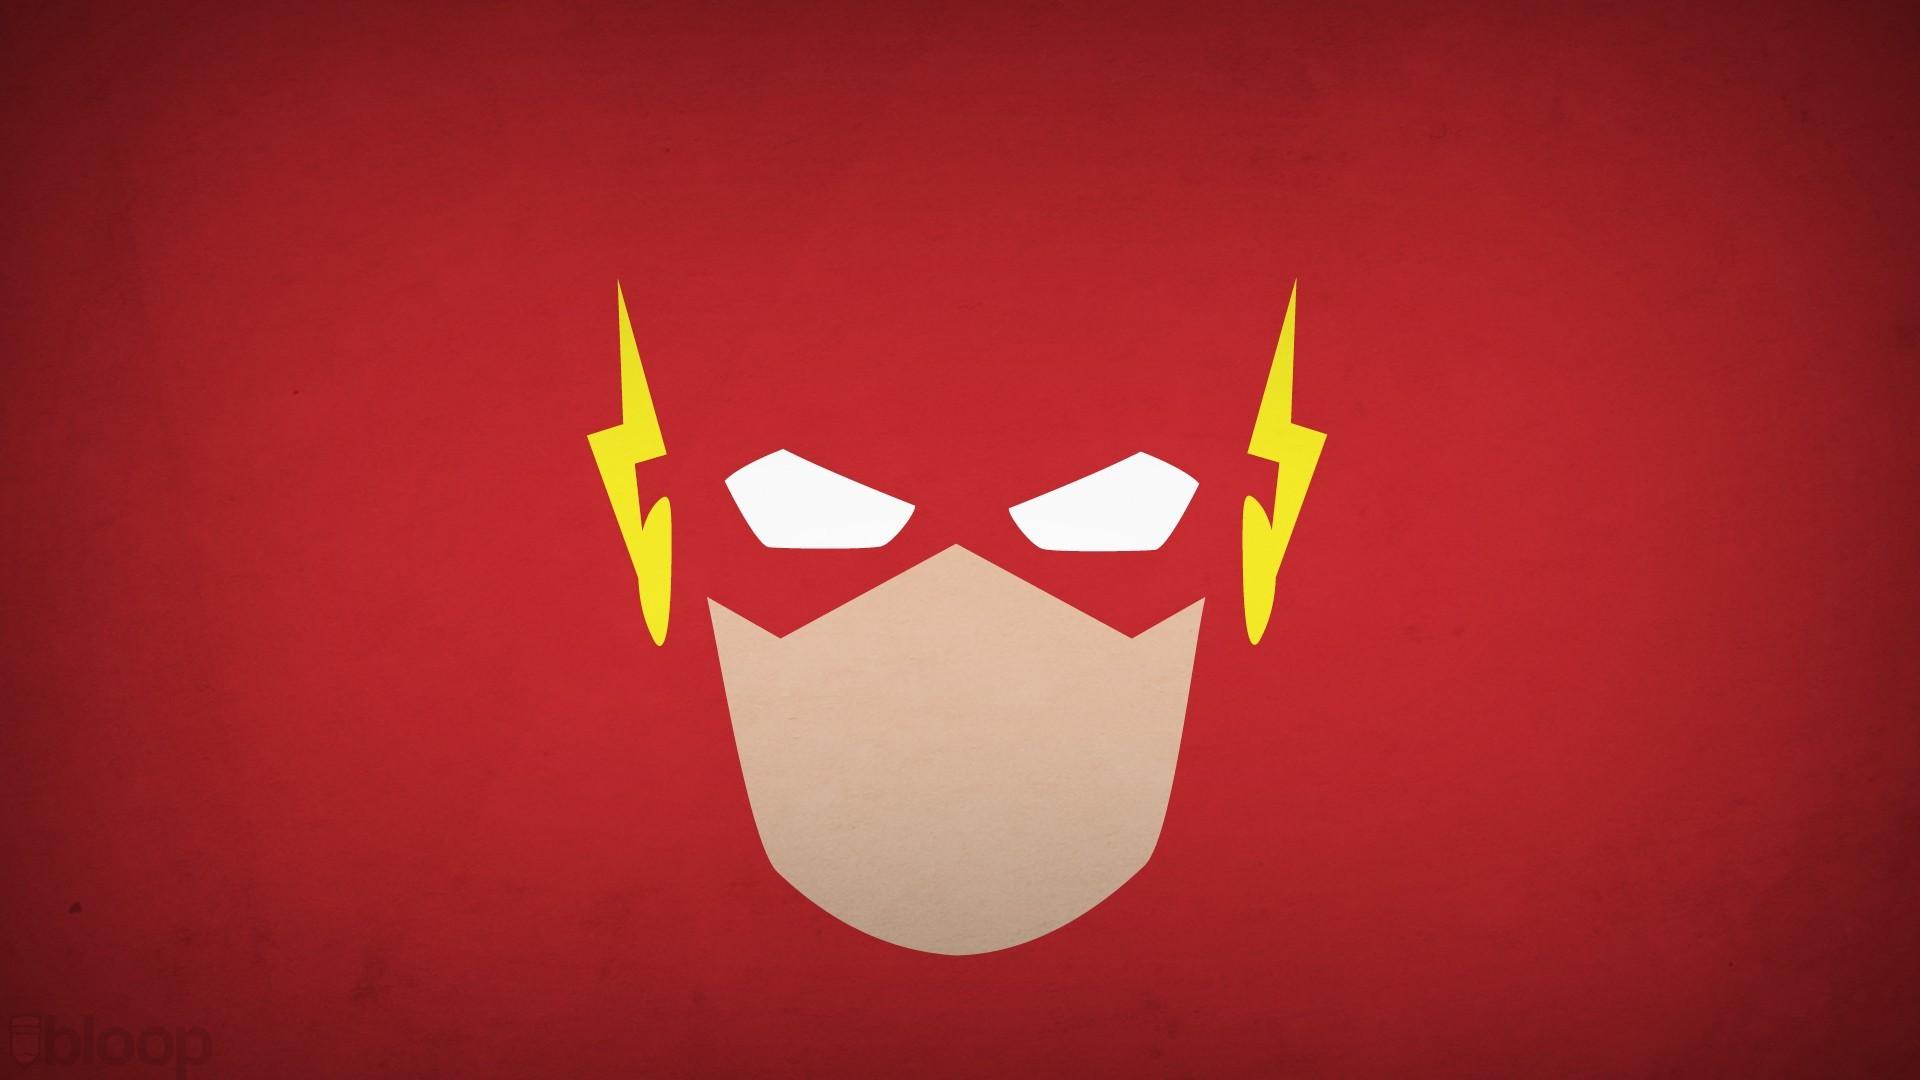 Fond d 39 cran illustration fond simple minimalisme fond rouge h ros super h ros dc comics - Flash le super heros ...